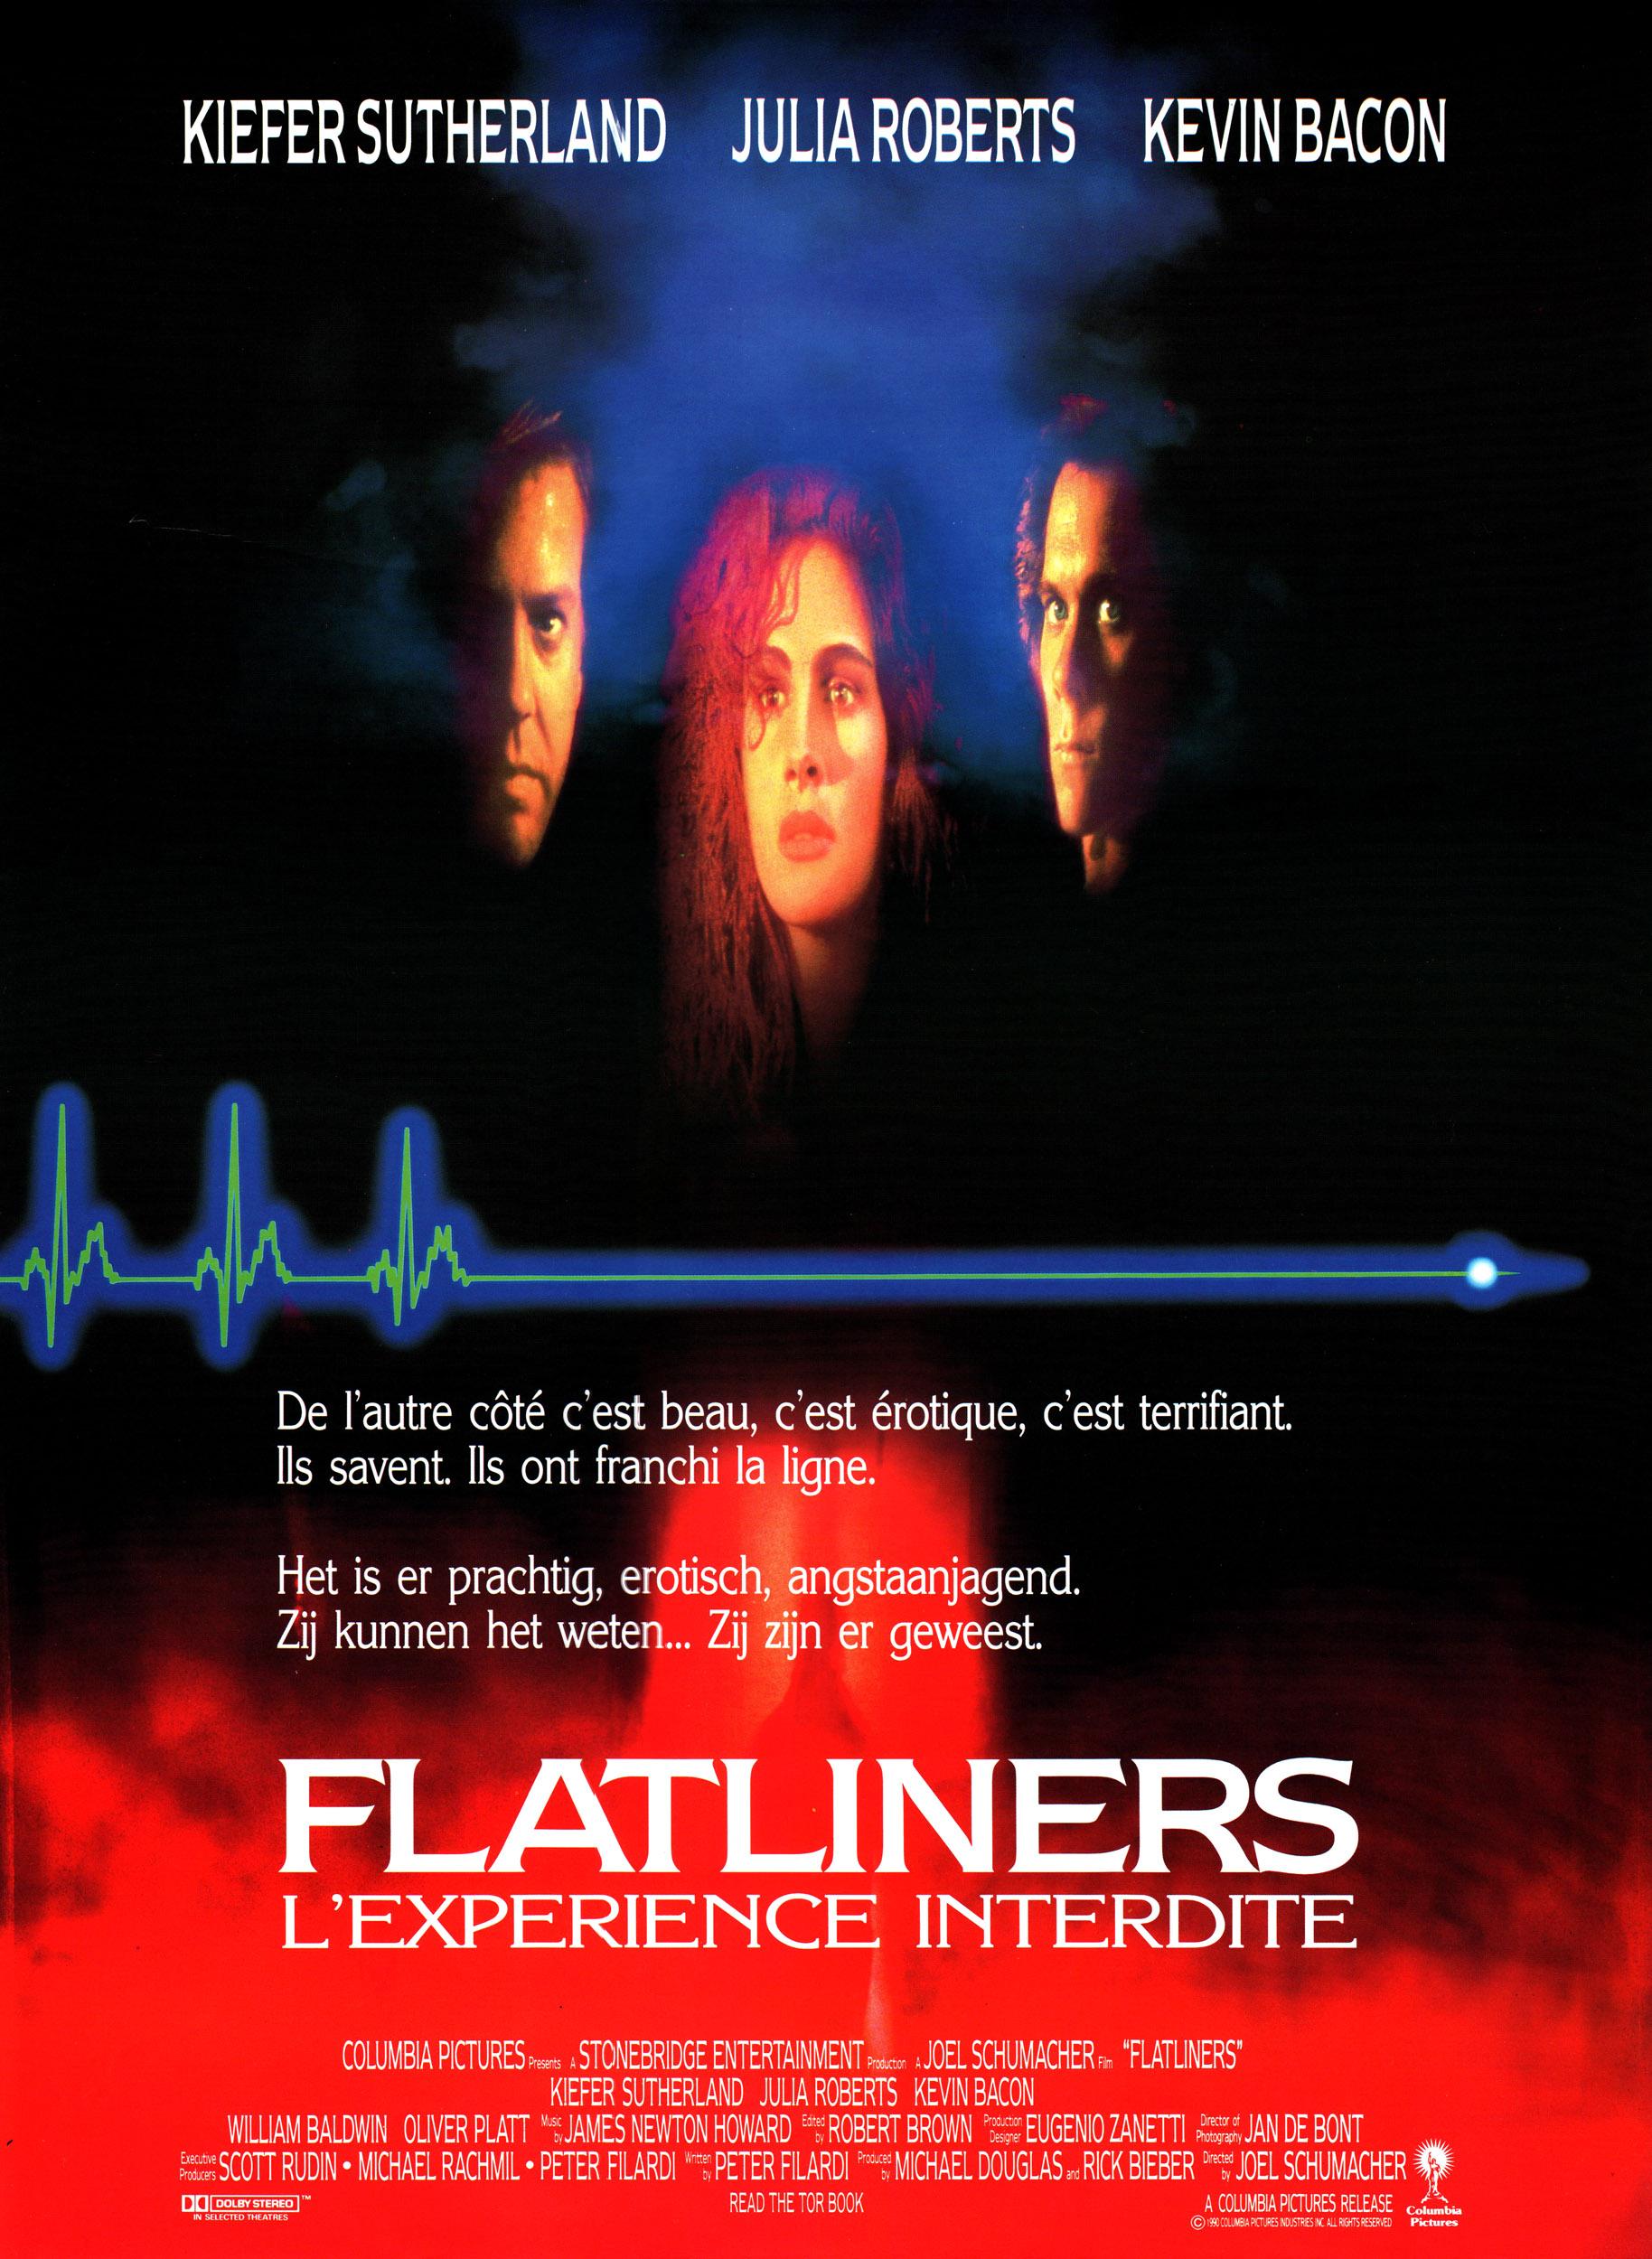 flatliners-belgium-small